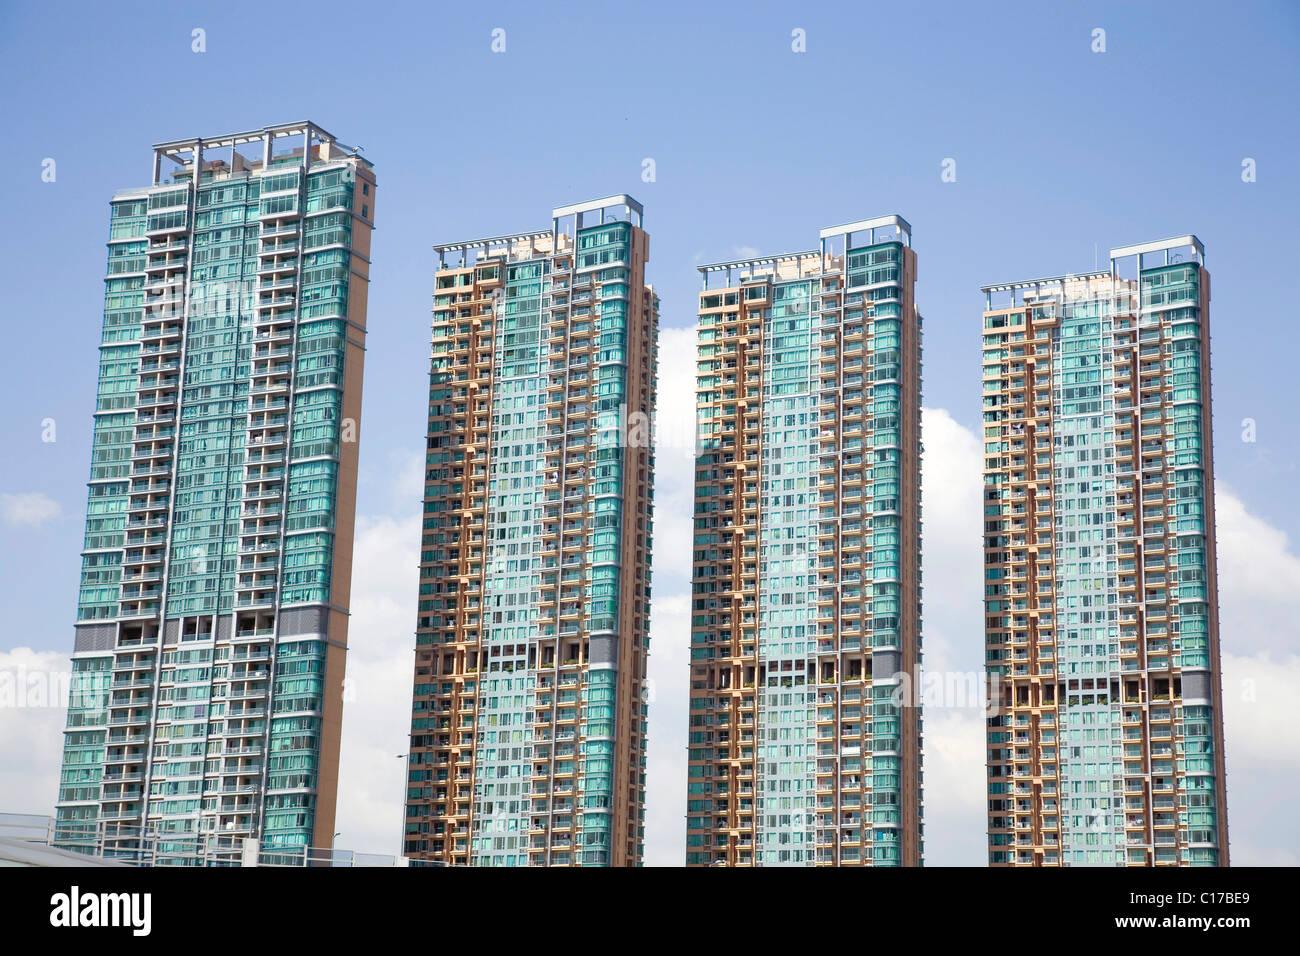 Residential area, multistory buildings, Hongkong, China, Asia - Stock Image